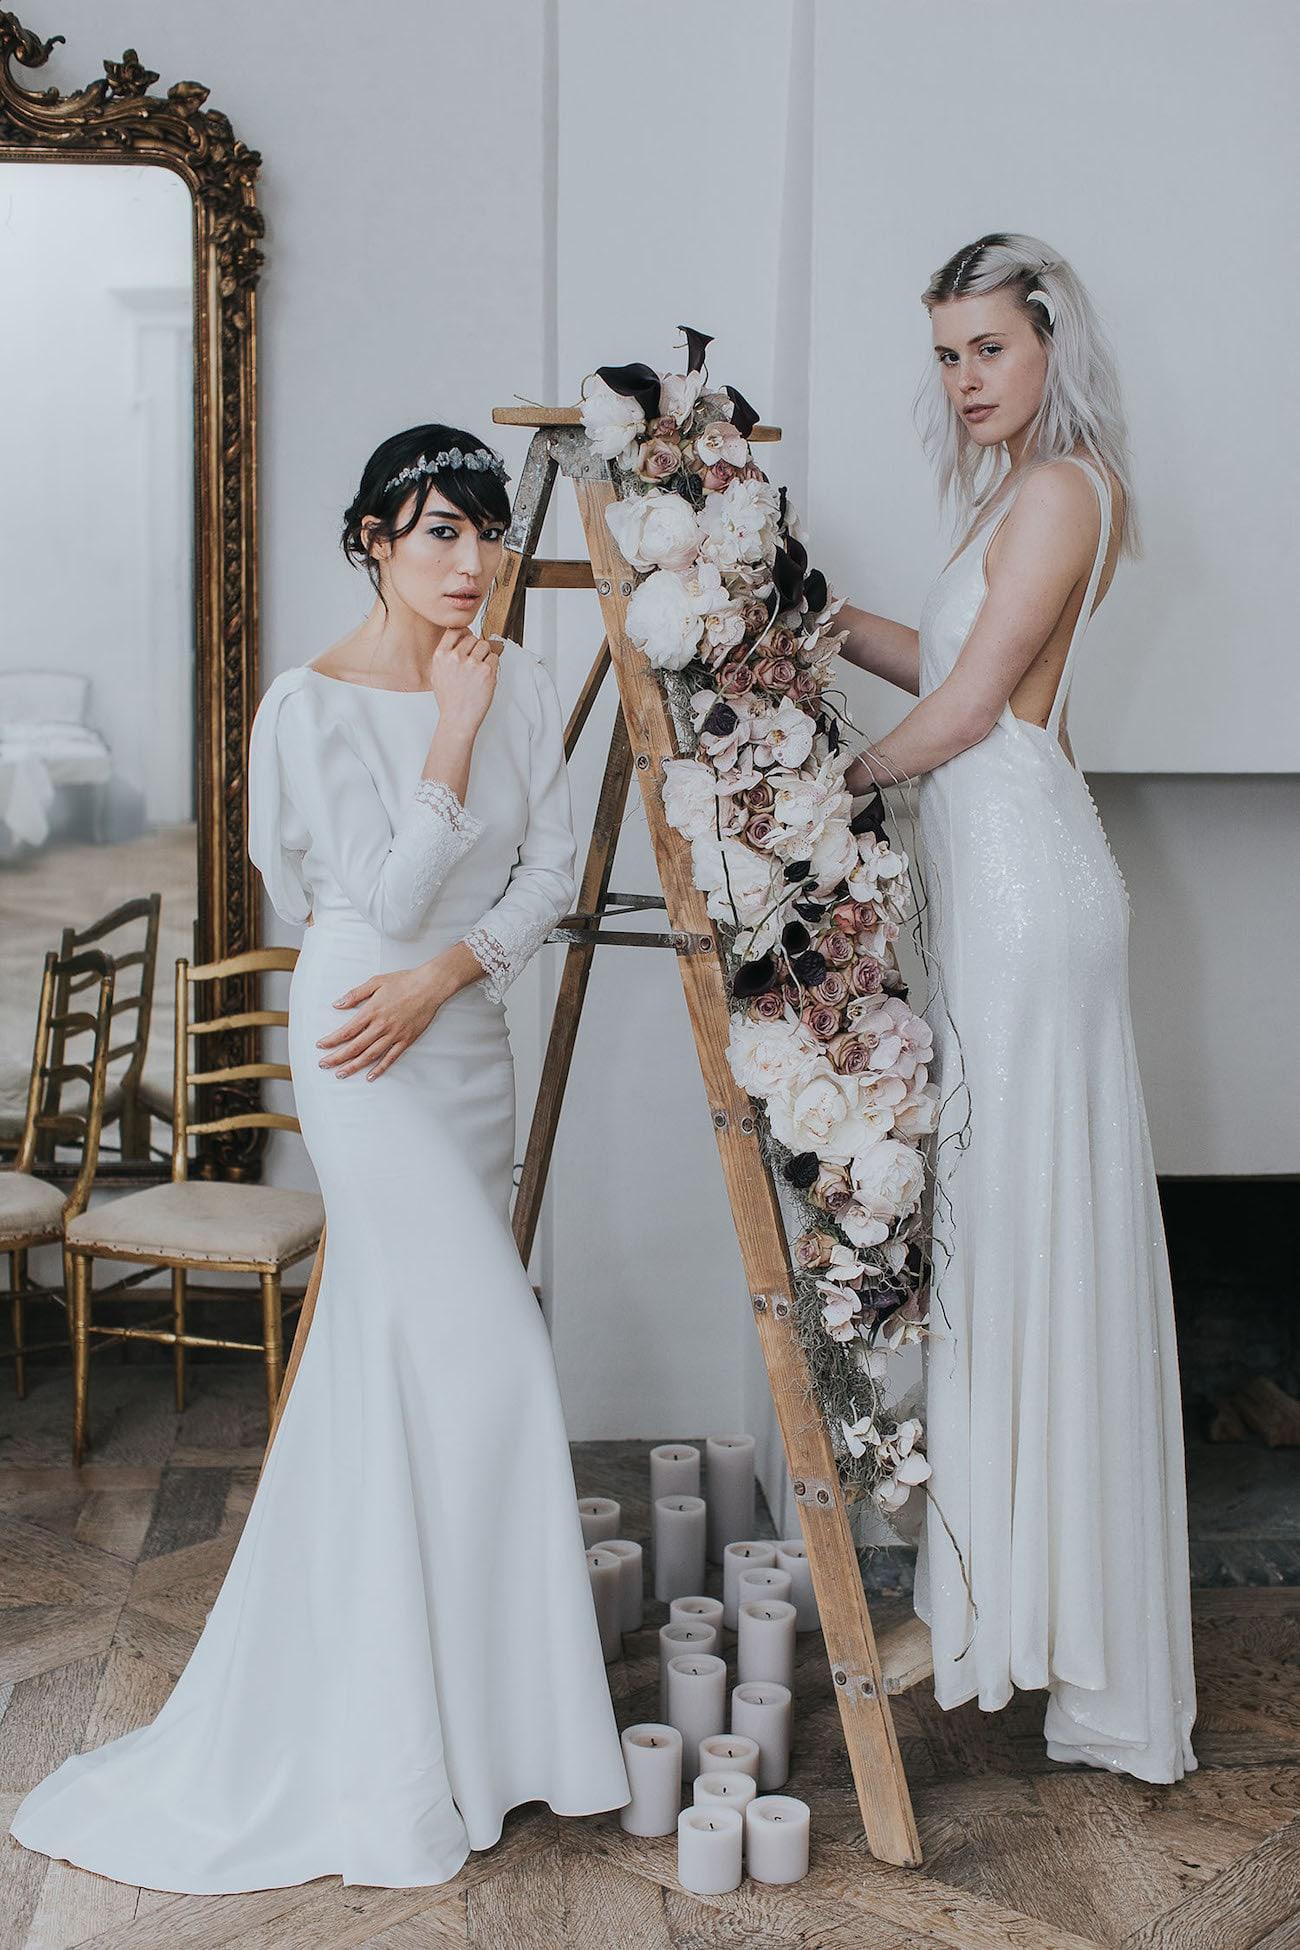 Celestial Romance Wedding Inspiration by Cornelia Lietz  Kiss from Fleur  SouthBound Bride